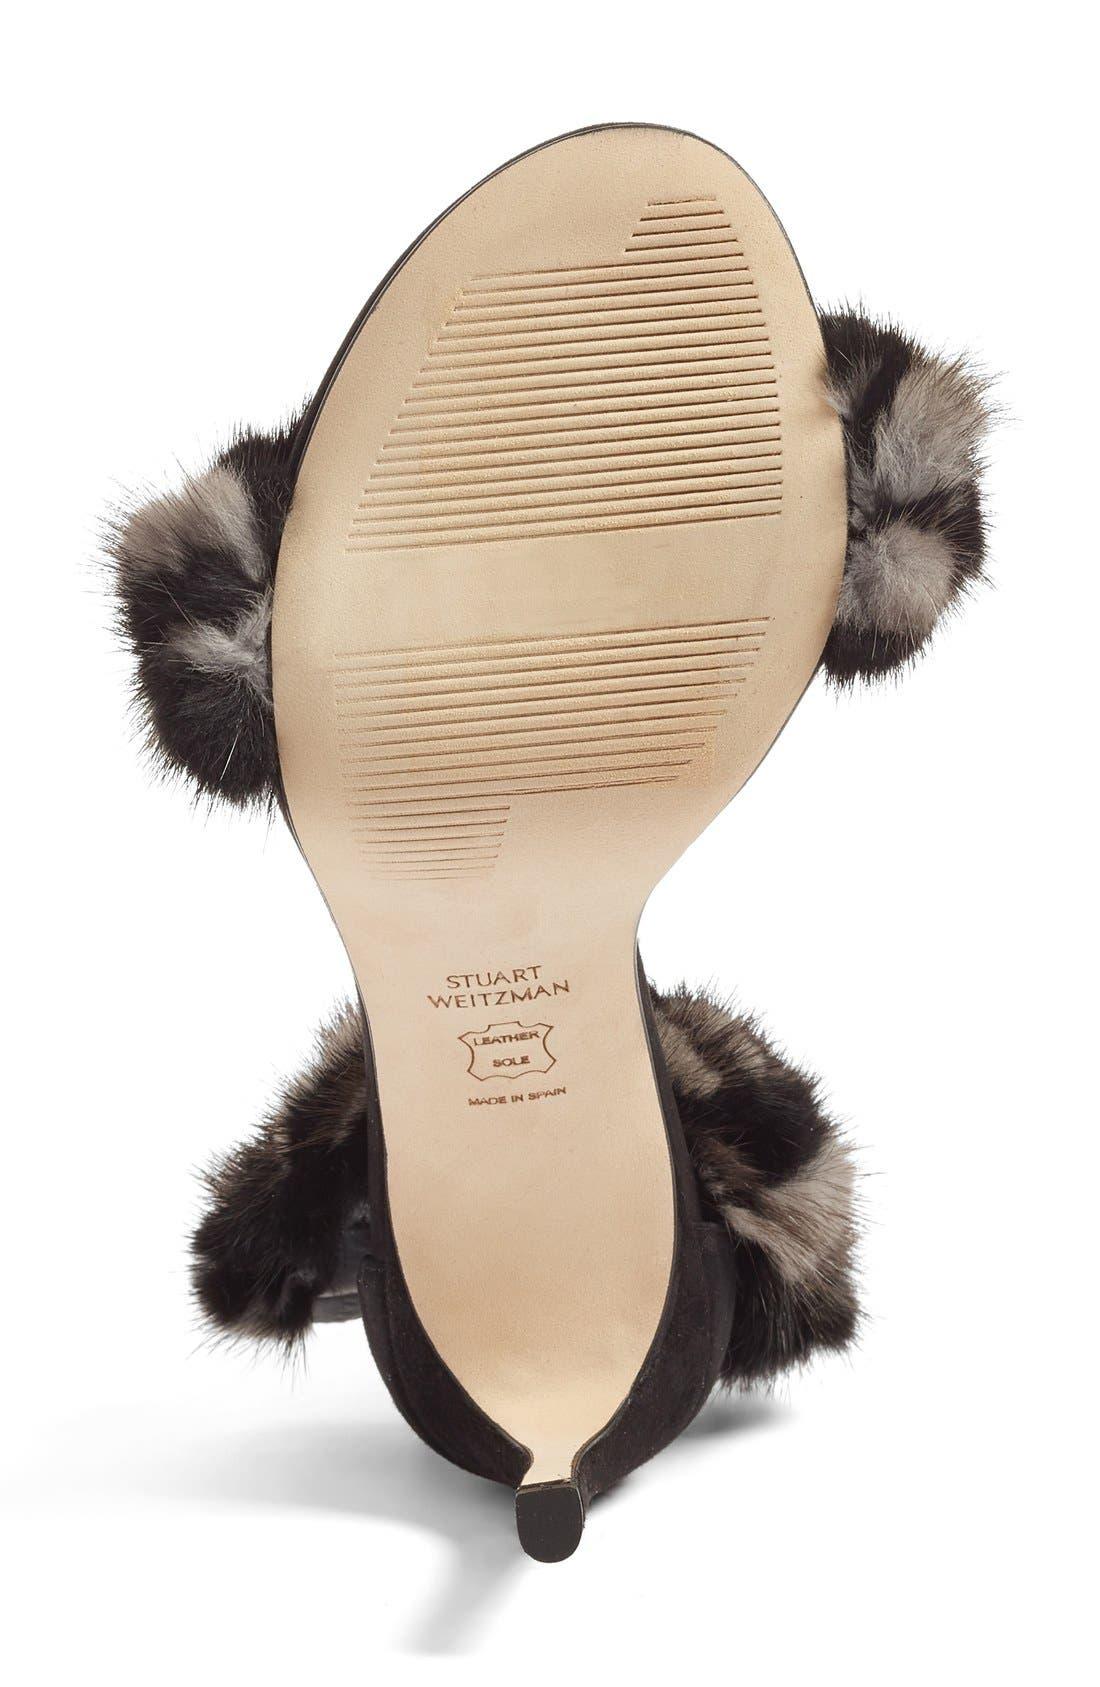 STUART WEITZMAN, 'Bunnylove' Genuine Mink Fur Ankle Strap Sandal, Alternate thumbnail 2, color, 980